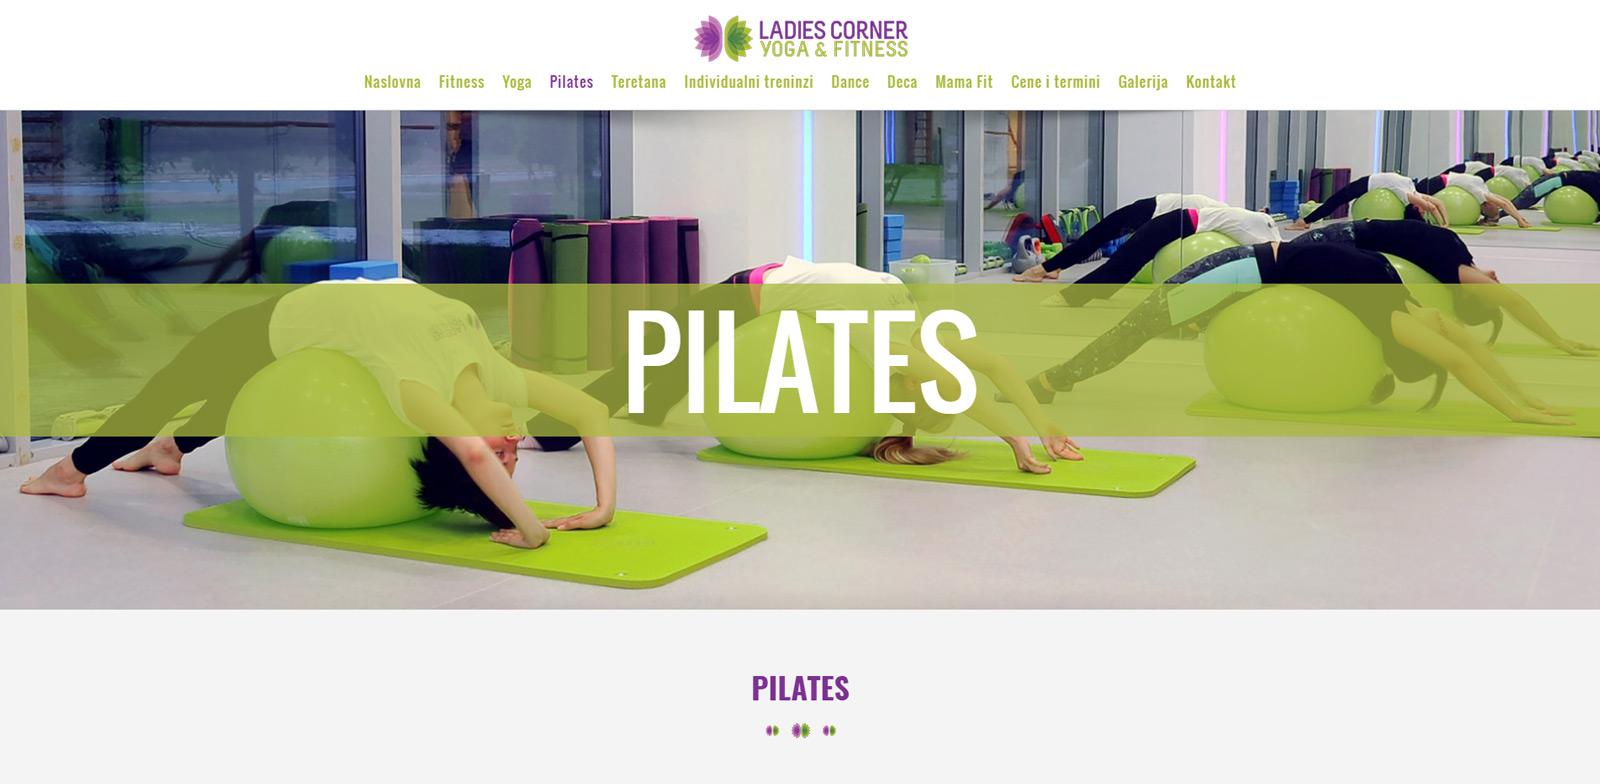 Ladies Corner Fitness & Gym